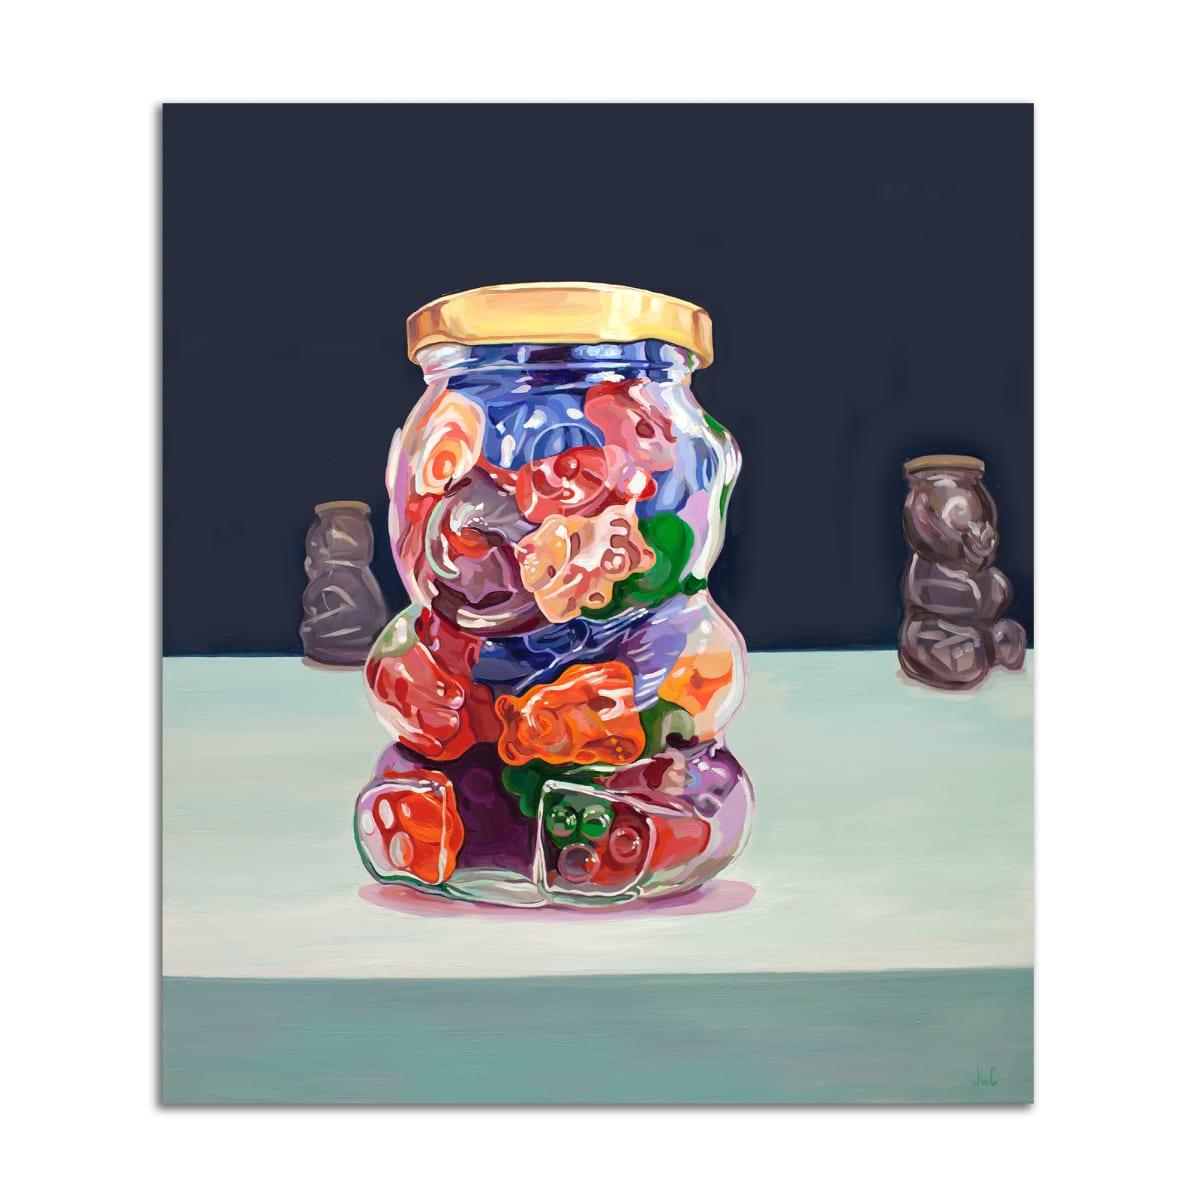 Gummy Bear Dream by Jared Gillett